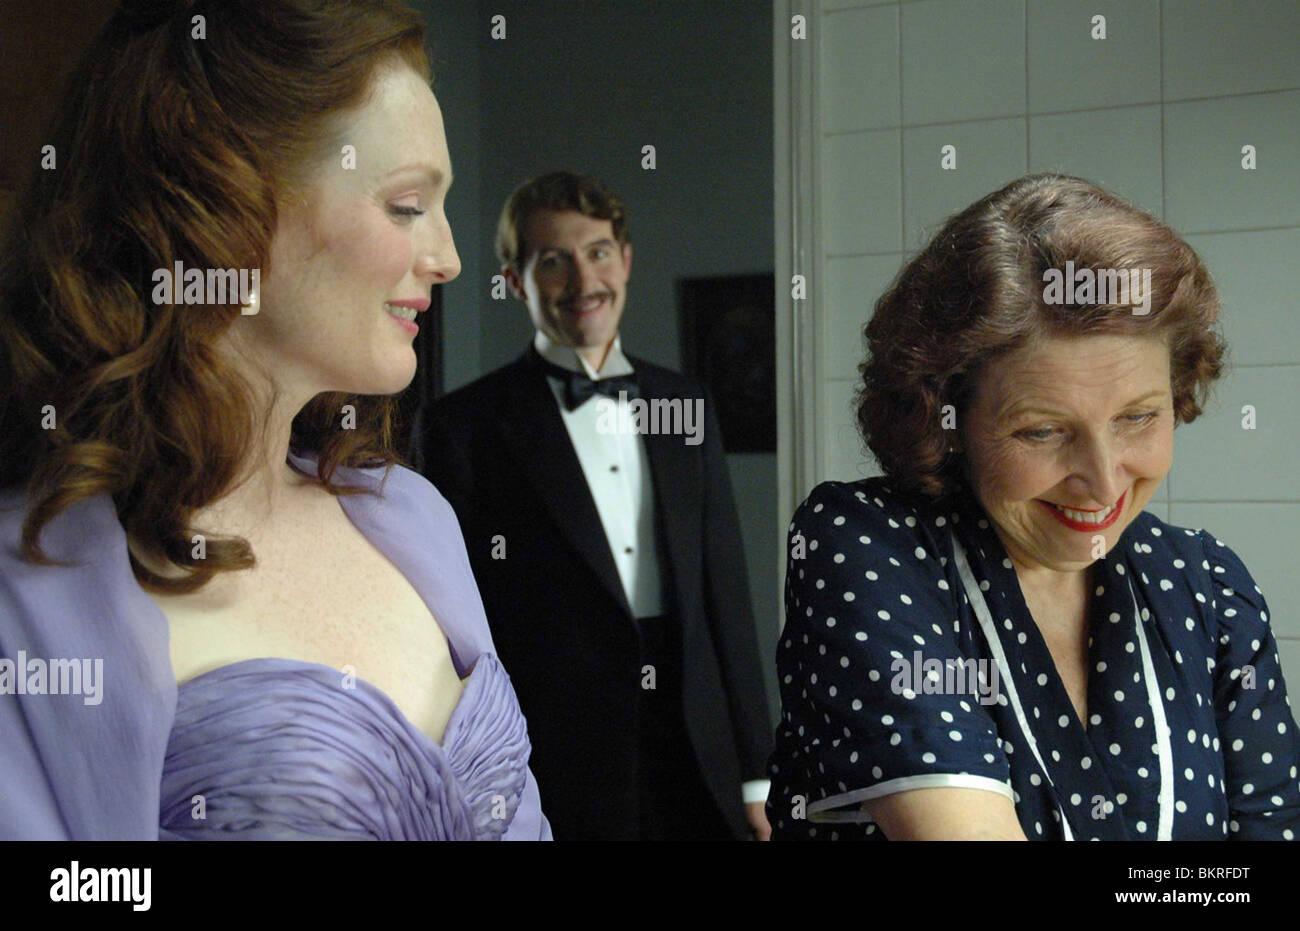 SAVAGE GRACE (2007) JULIANNE MOORE, STEPHEN DILLANE, ANN REID TOM KALIN (DIR) 004 - Stock Image